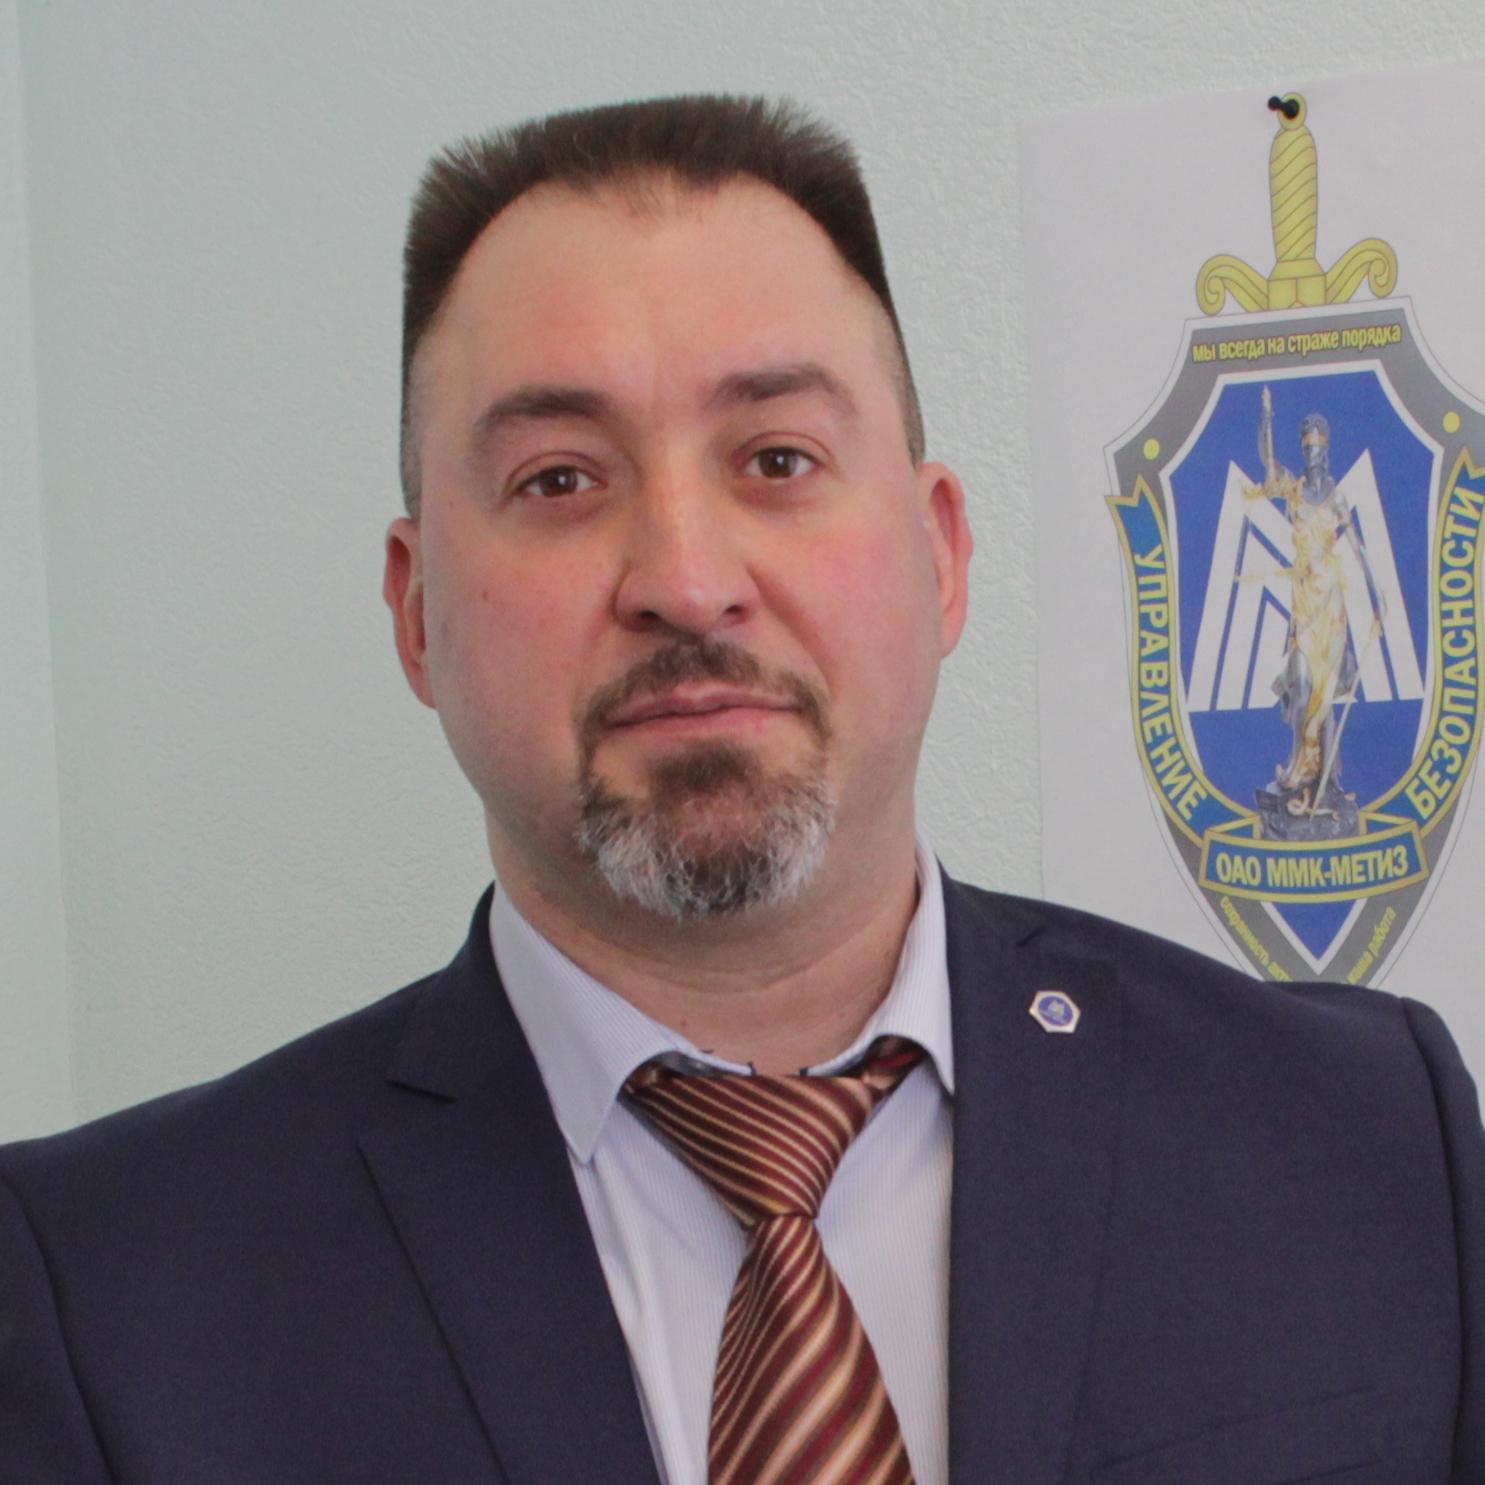 Копцев ММК МЕтиз (1)